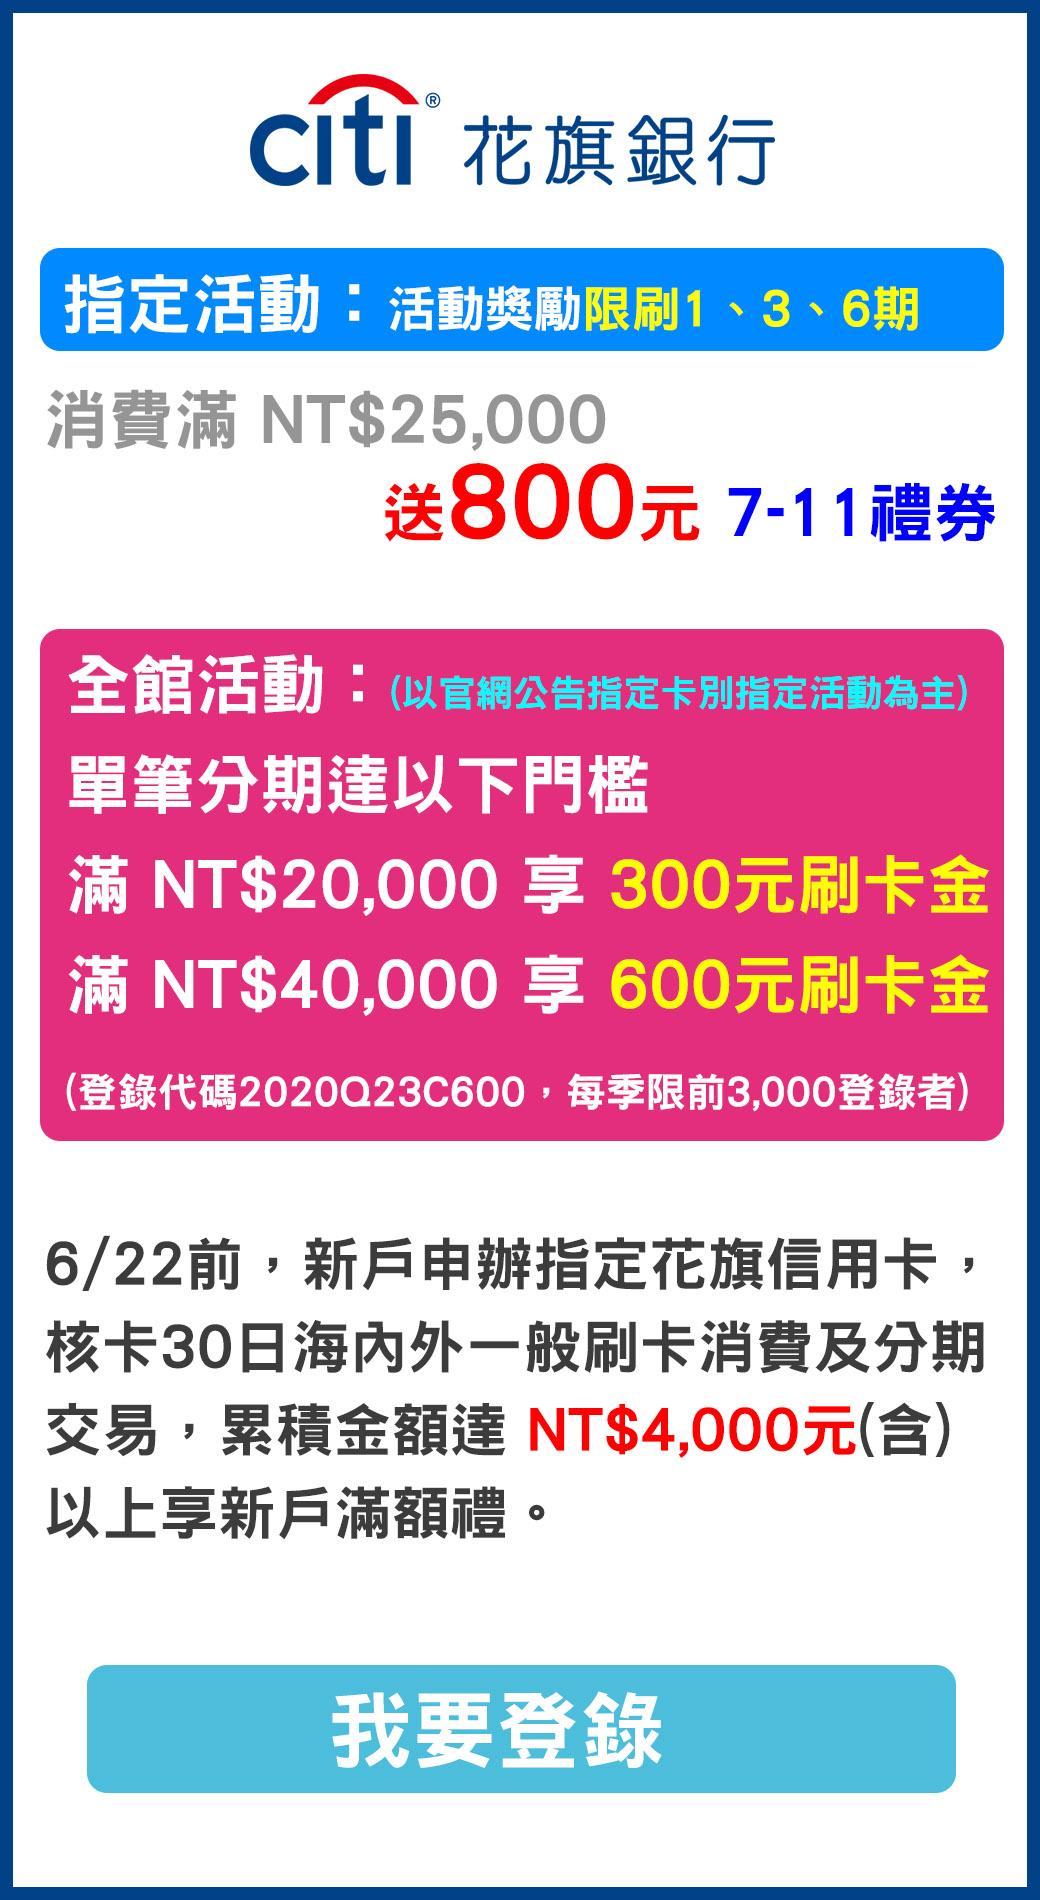 http://forum.sinya.com.tw/upload/attachment/2020/5efc09d4c0ce74764.jpg